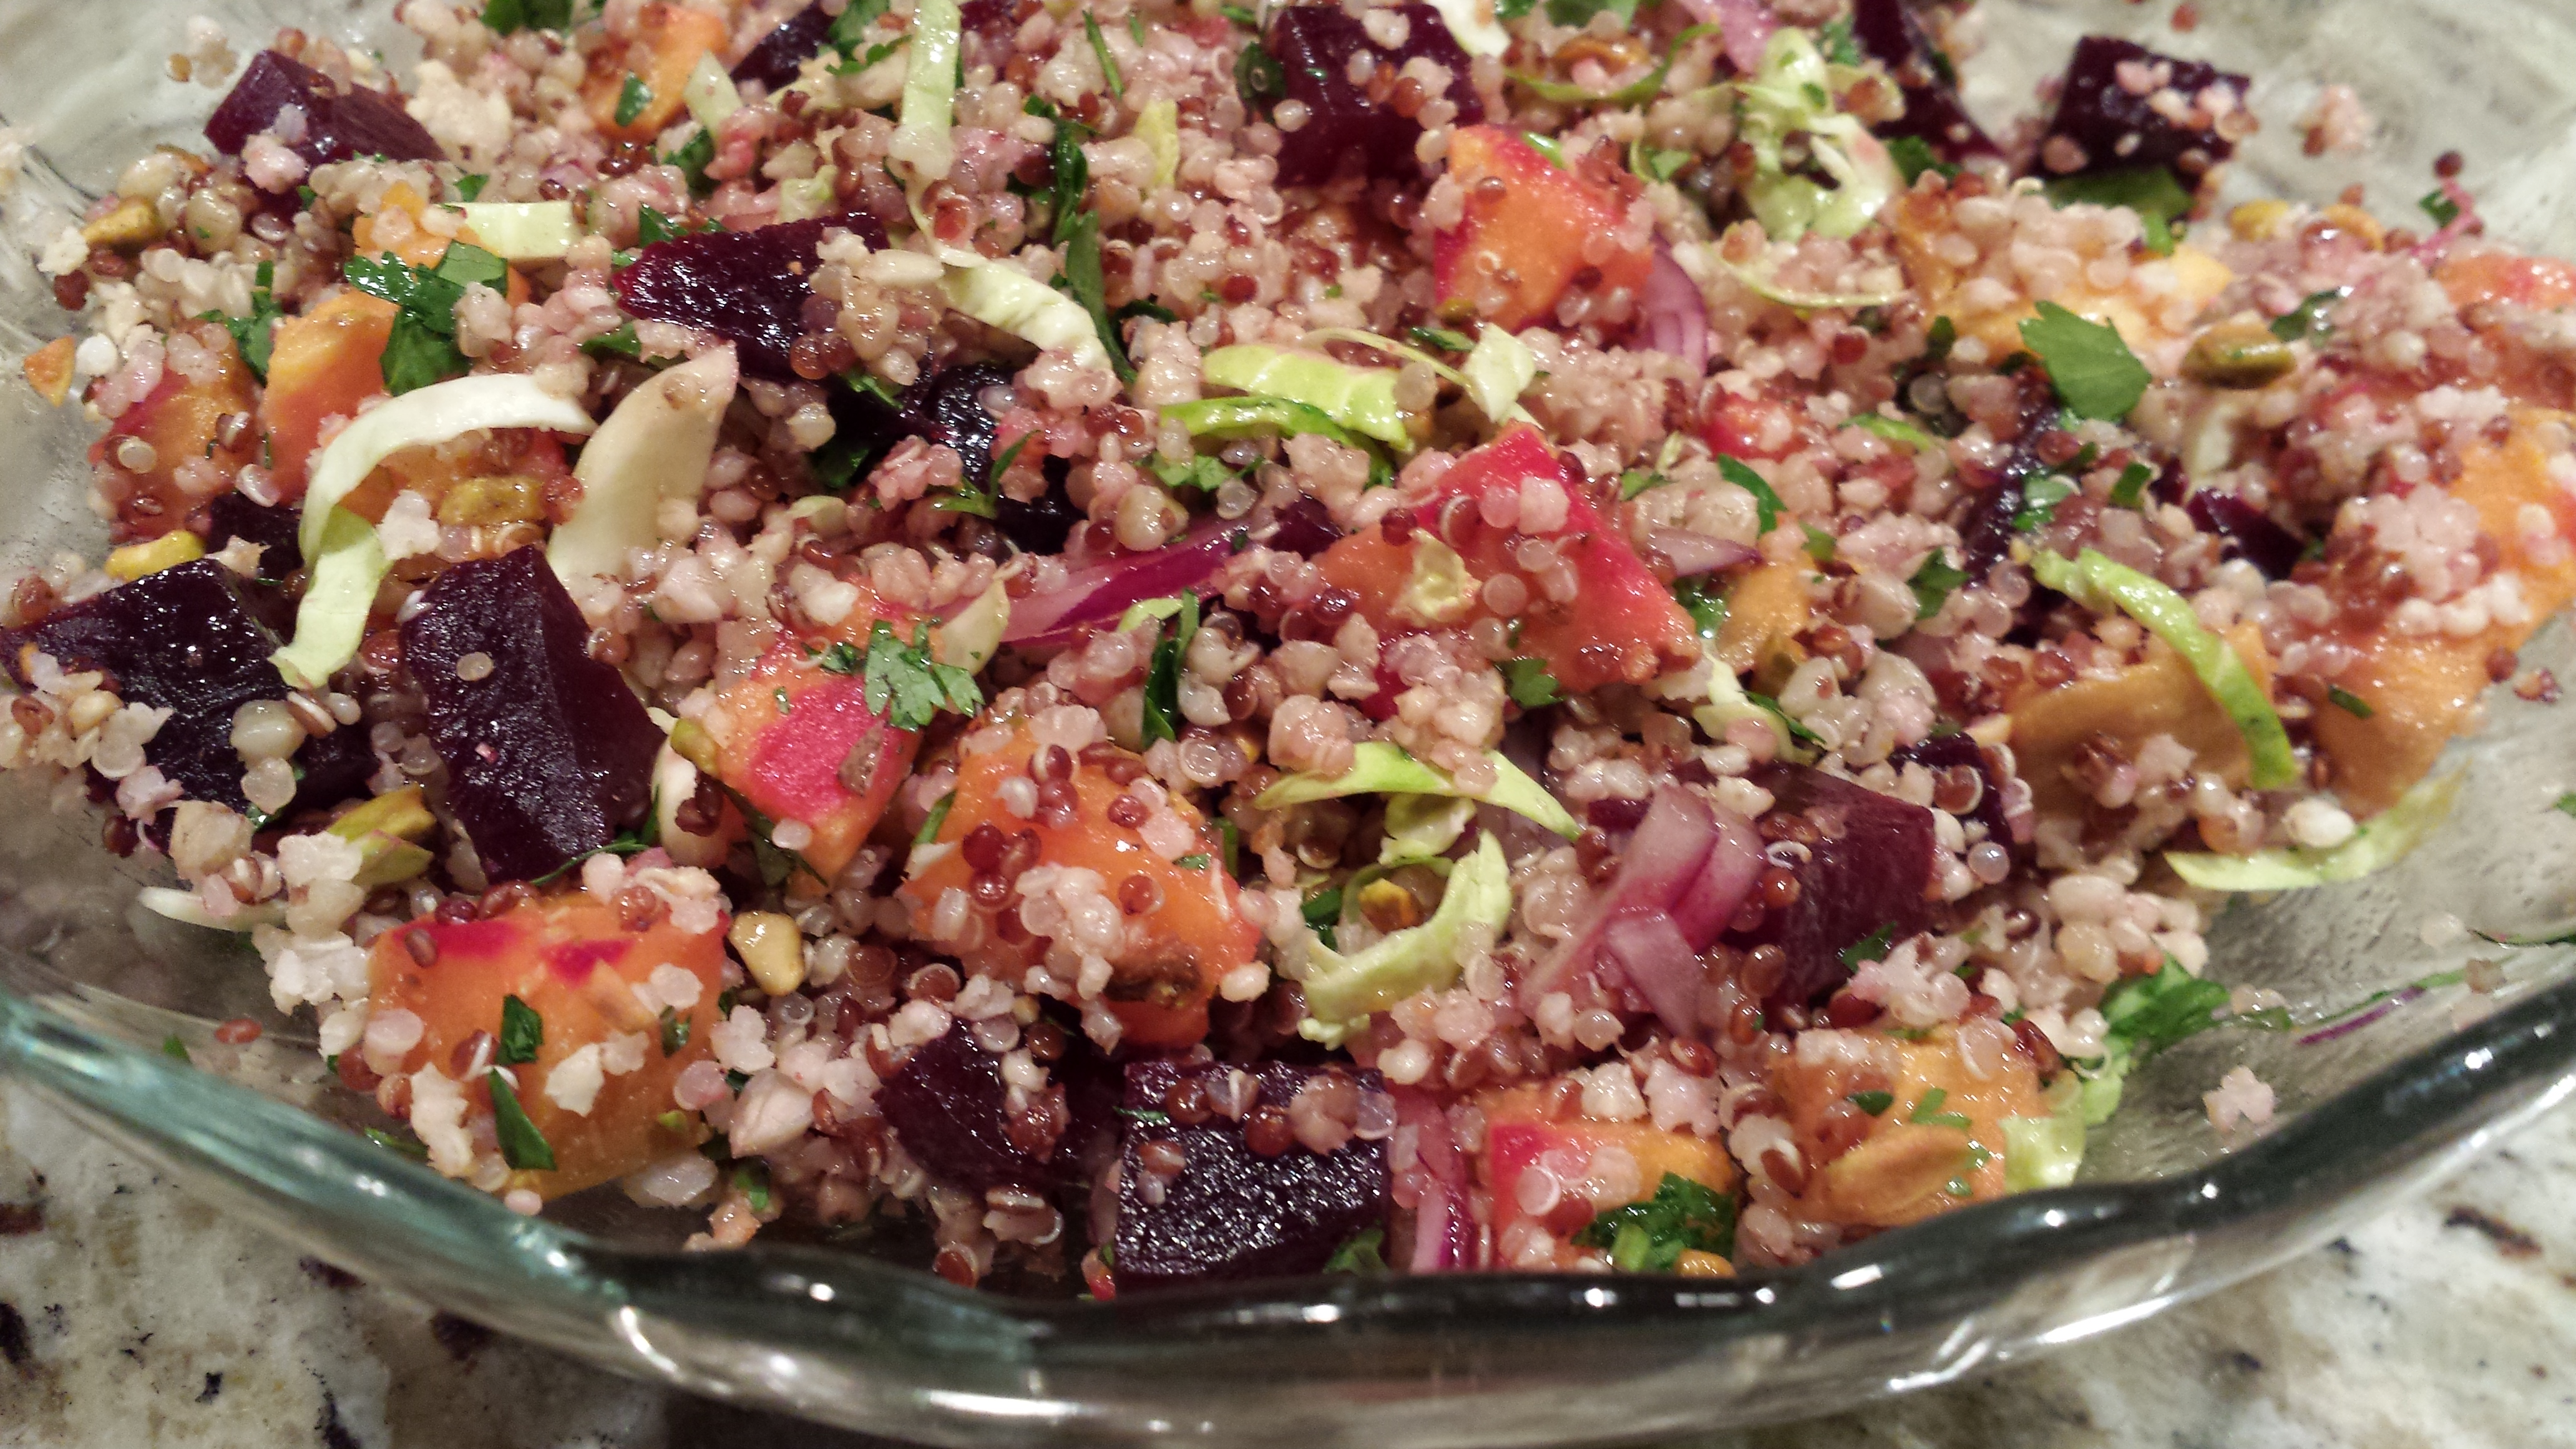 Whole foods market super grains recipes archives a food lovers autumn harvest super grains salad forumfinder Images